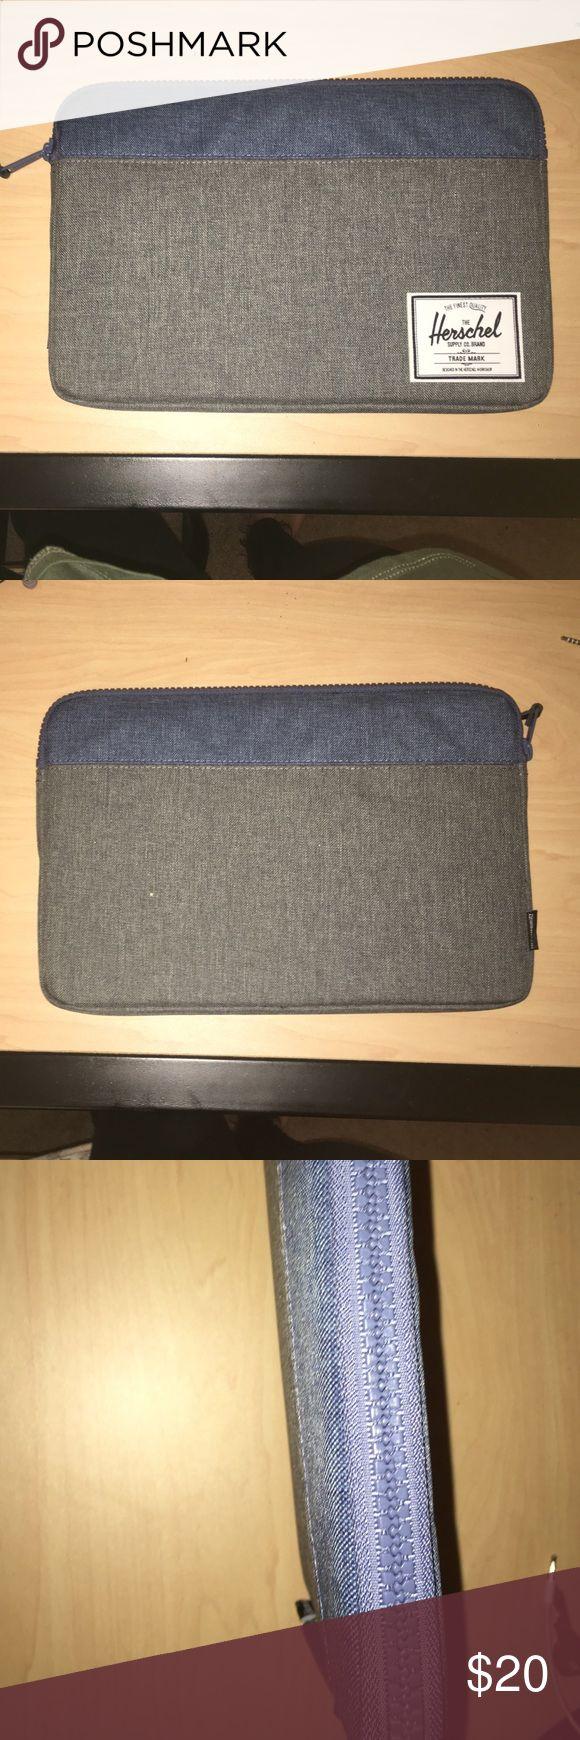 "Never been used, authentic Herschel laptop sleeve grey + blue, never been used, authentic, fits 11"" laptops Herschel Supply Company Other"